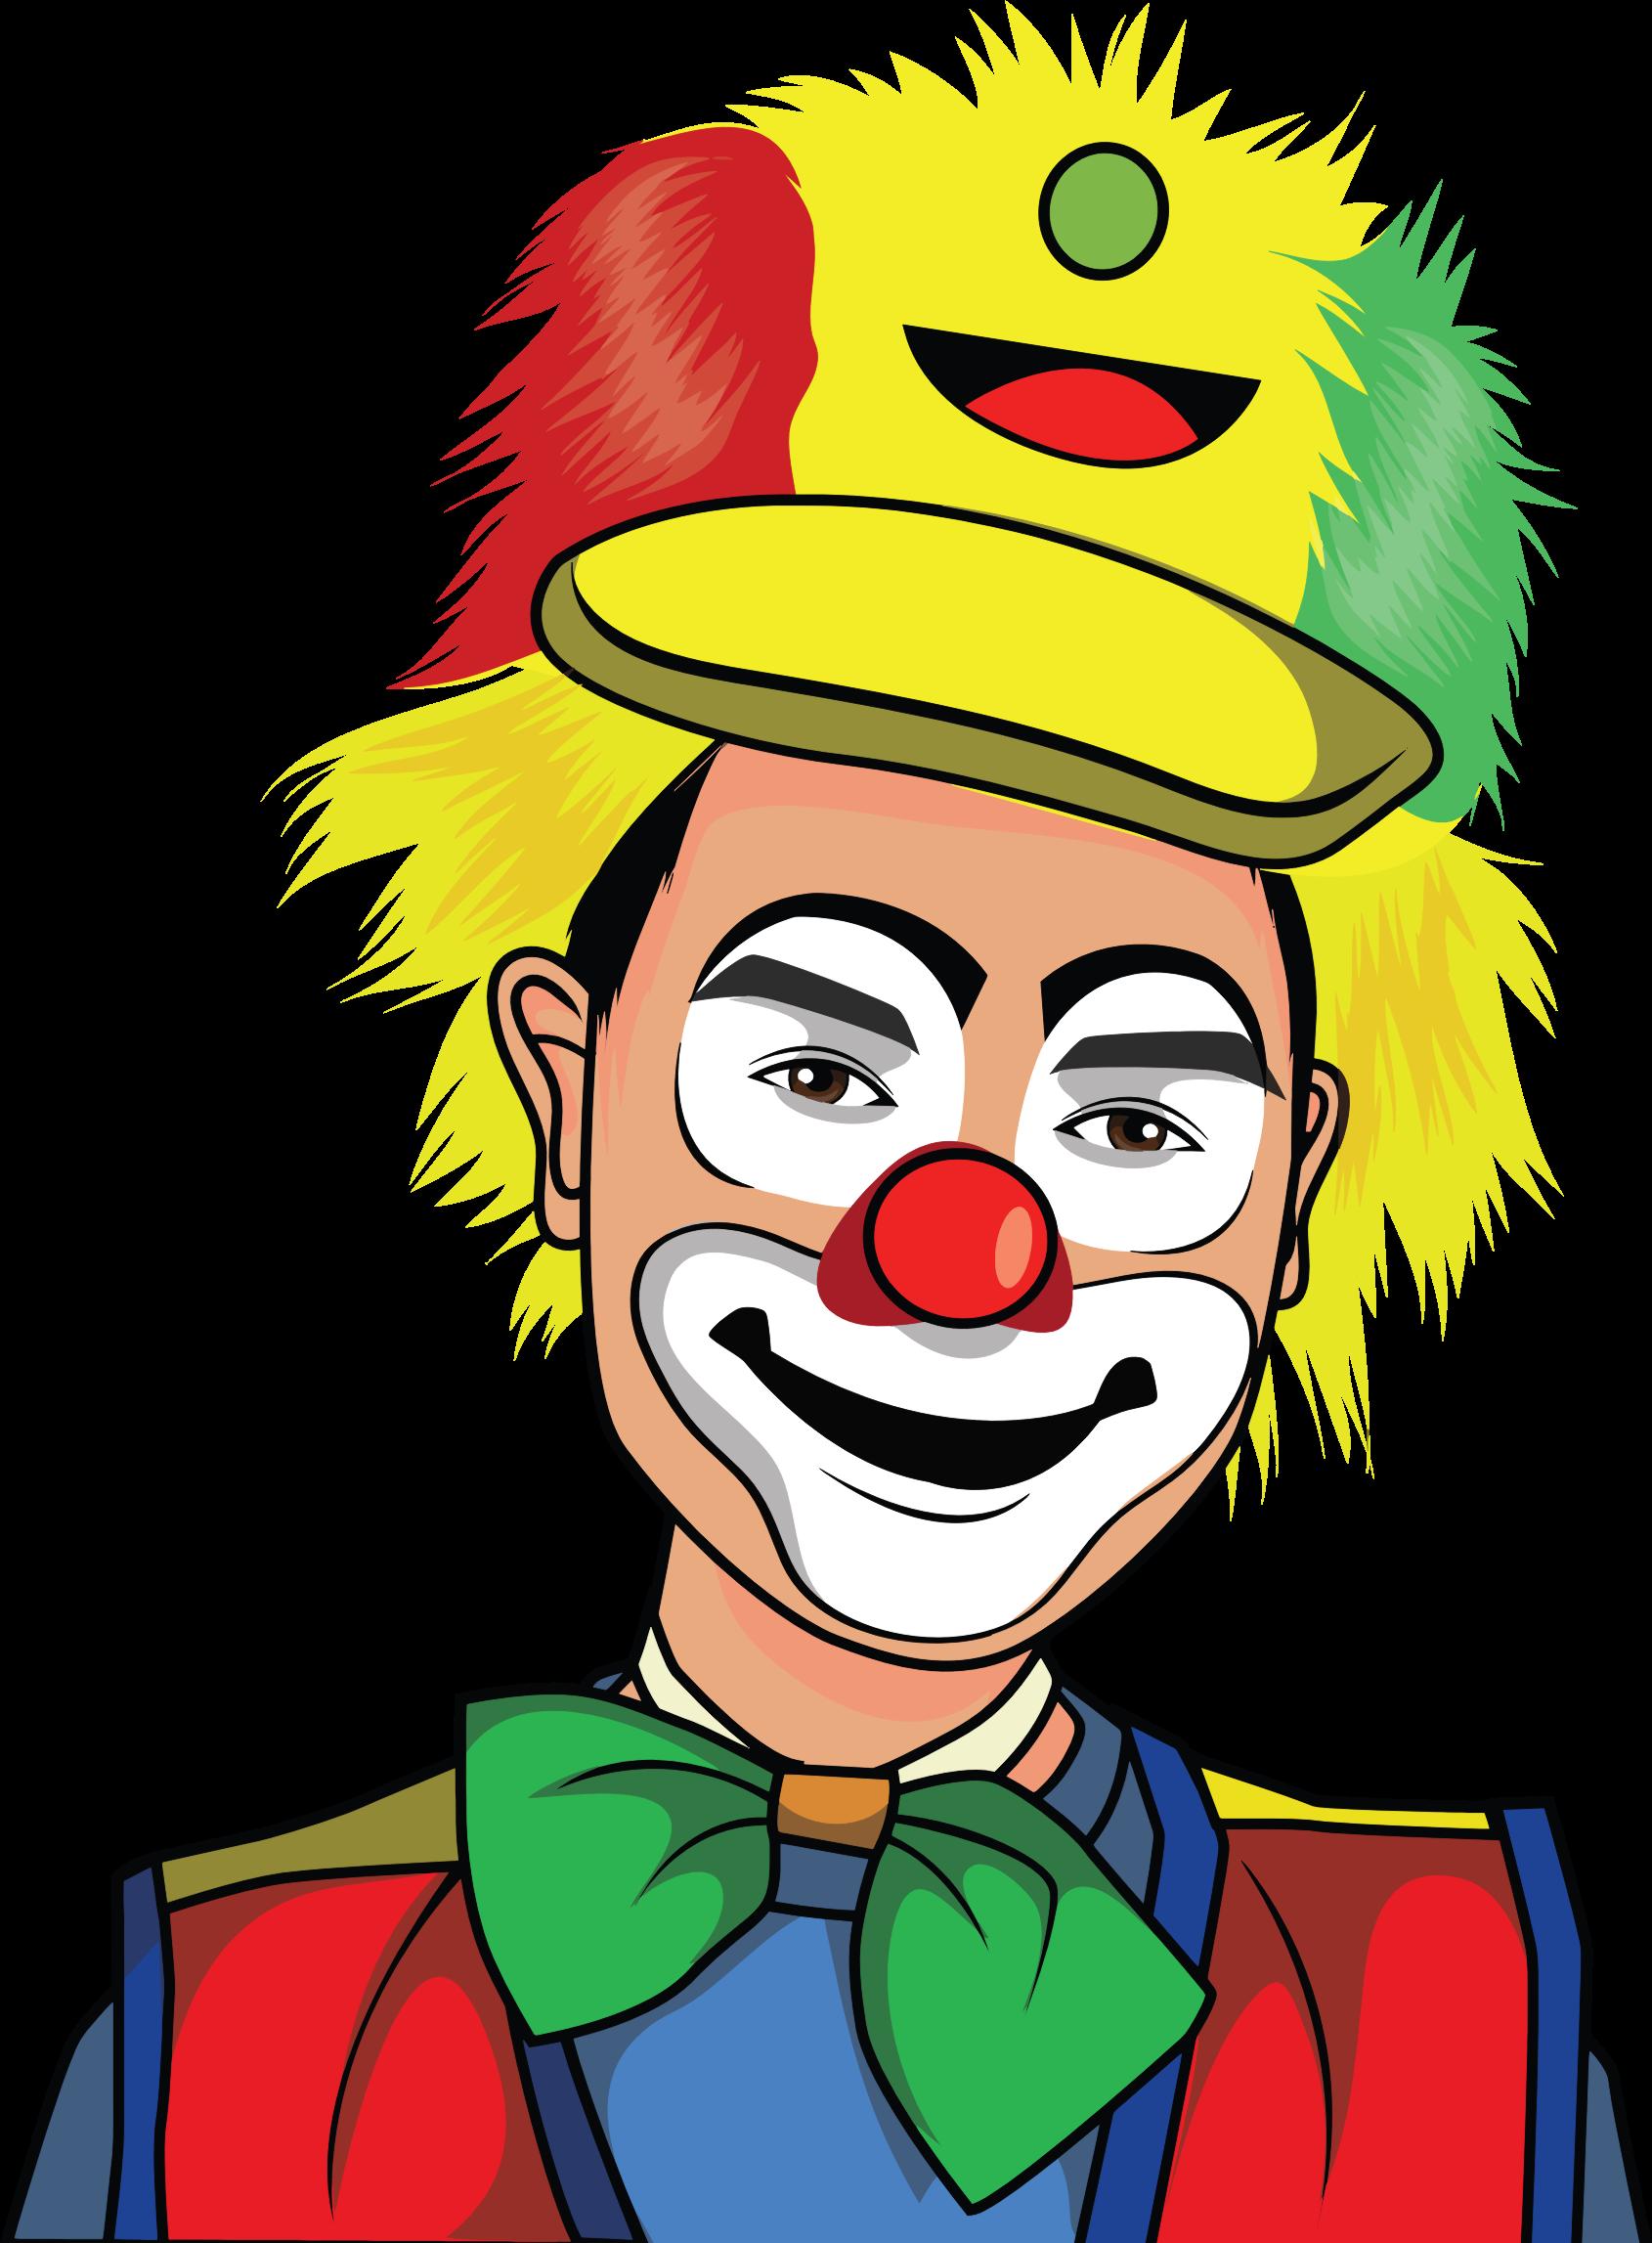 Illustration big image png. Clown clipart clown costume